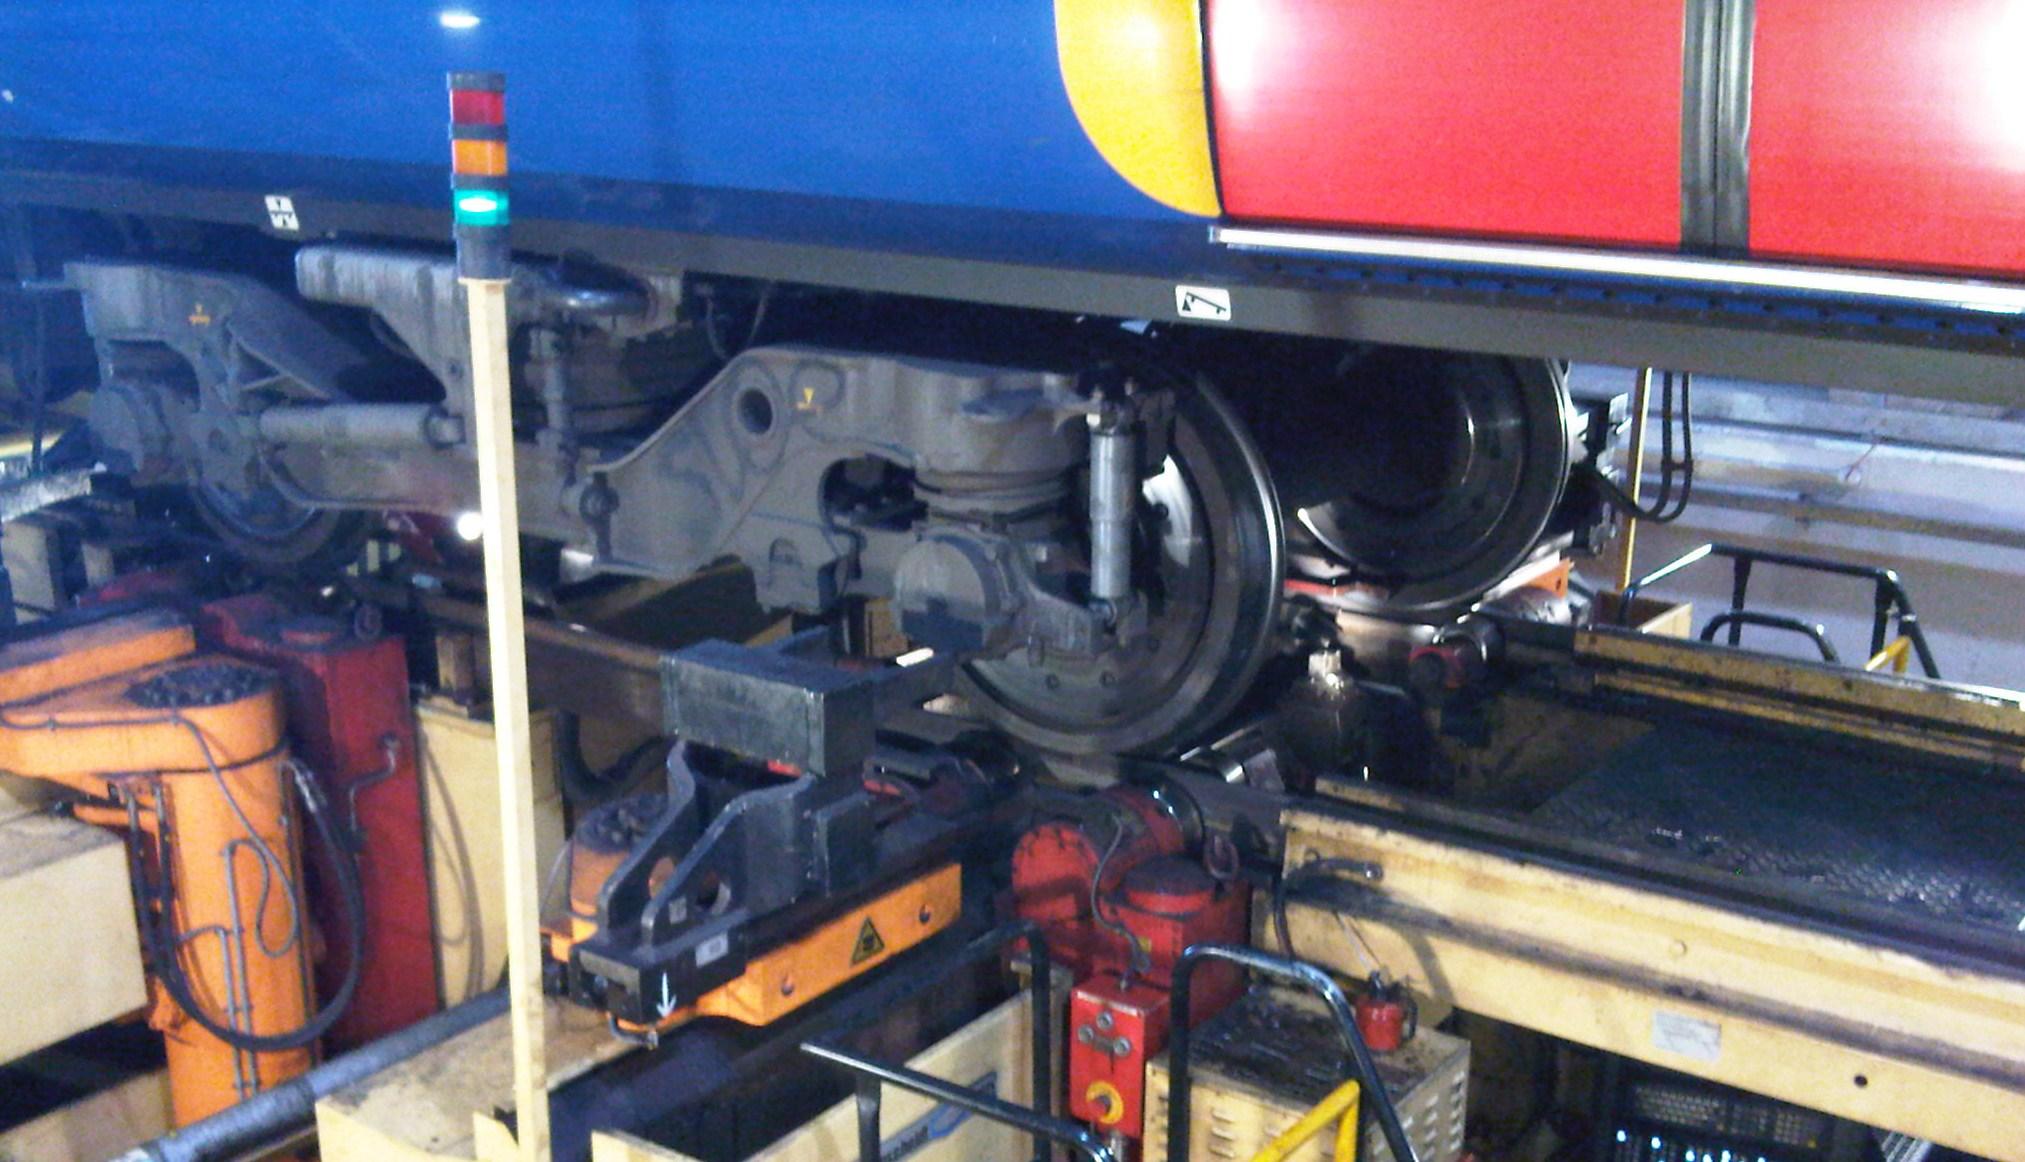 Underfloor railway wheel lathe